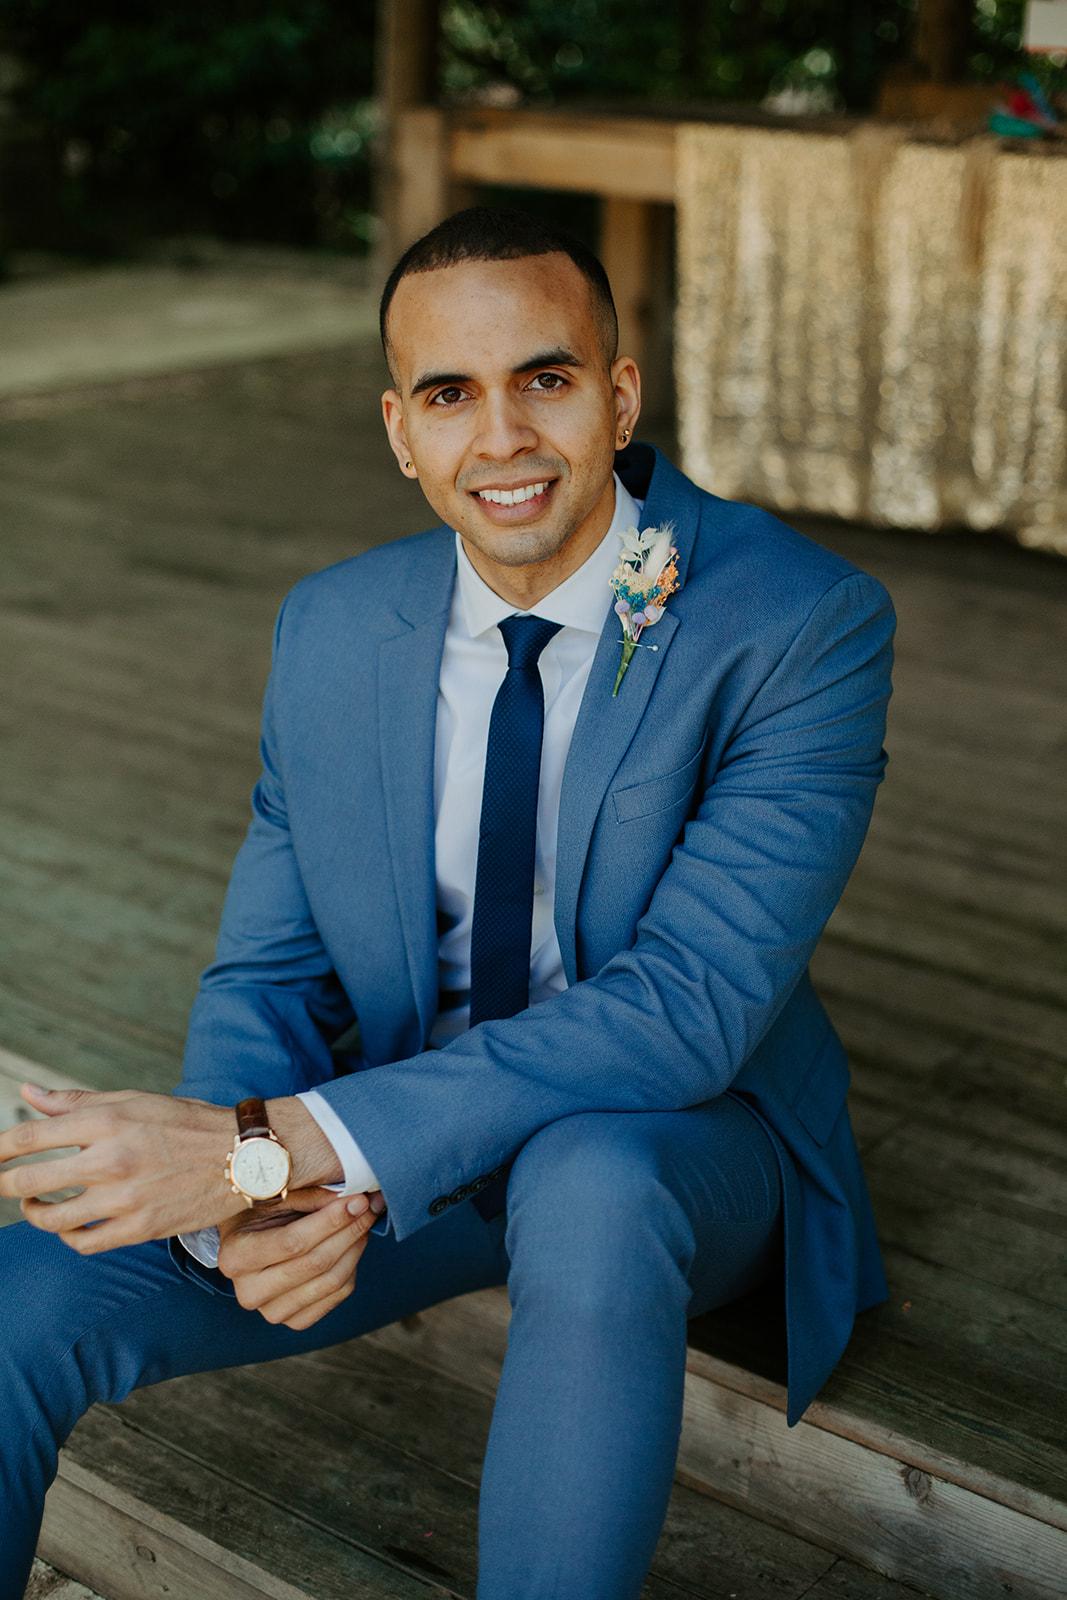 drive in wedding - camper van wedding - groom in blue suit